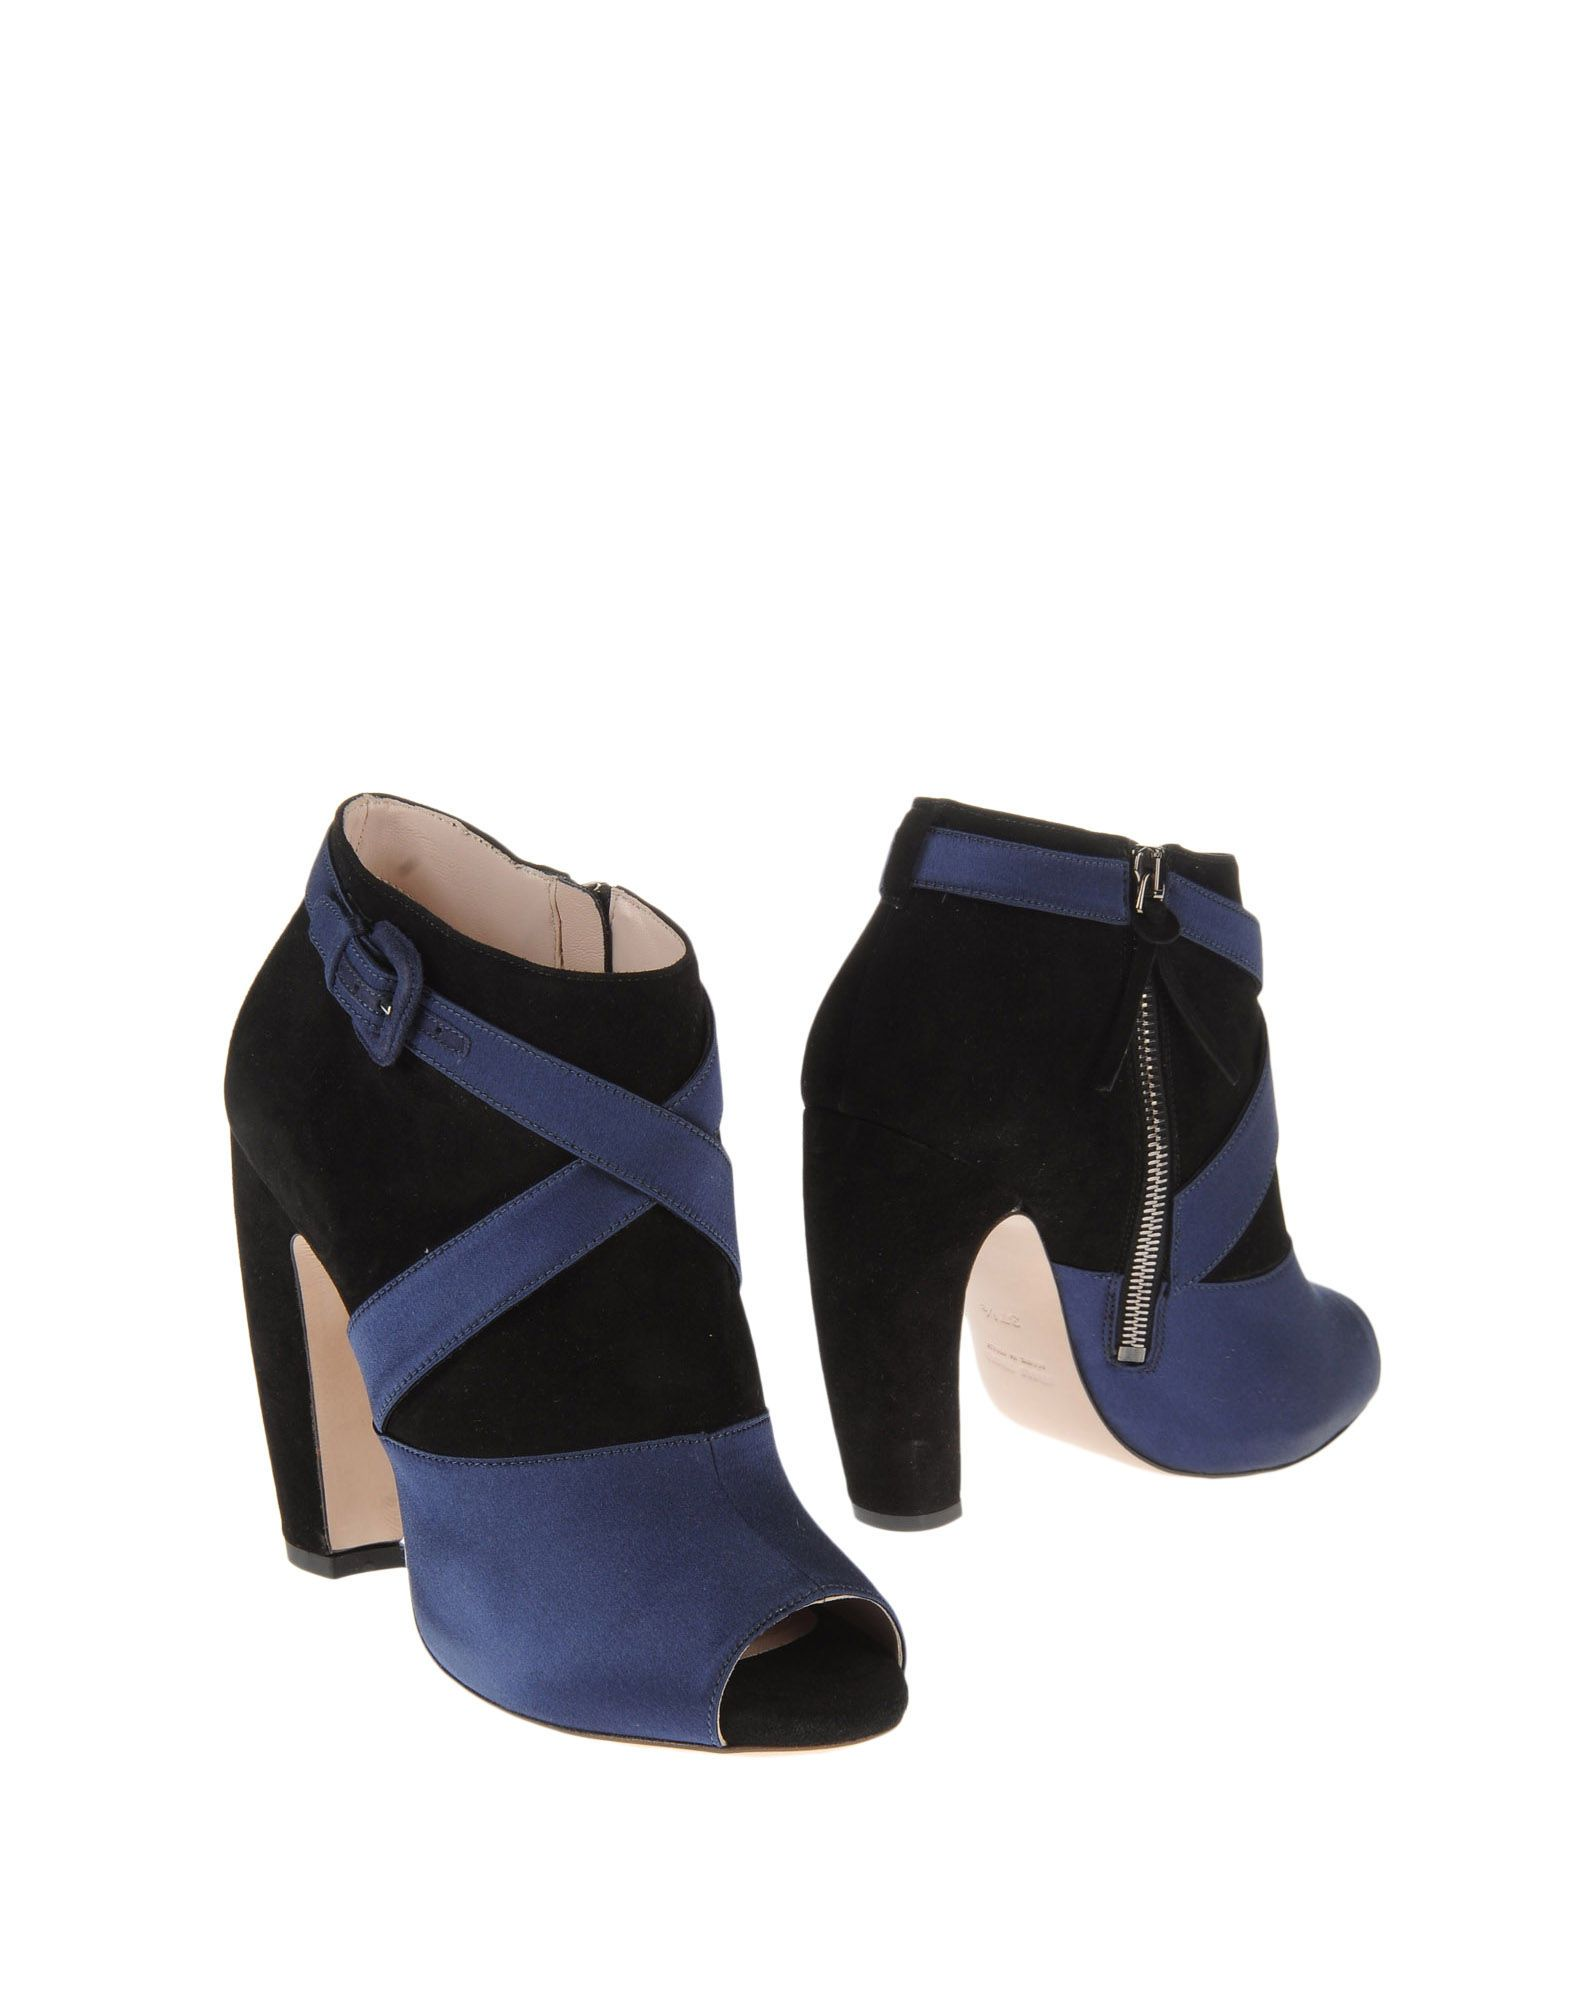 best website 18fbe 269af V|\\ : Stivaletti MIU MIU | Zoot | Fashion, Blue ankle boots ...